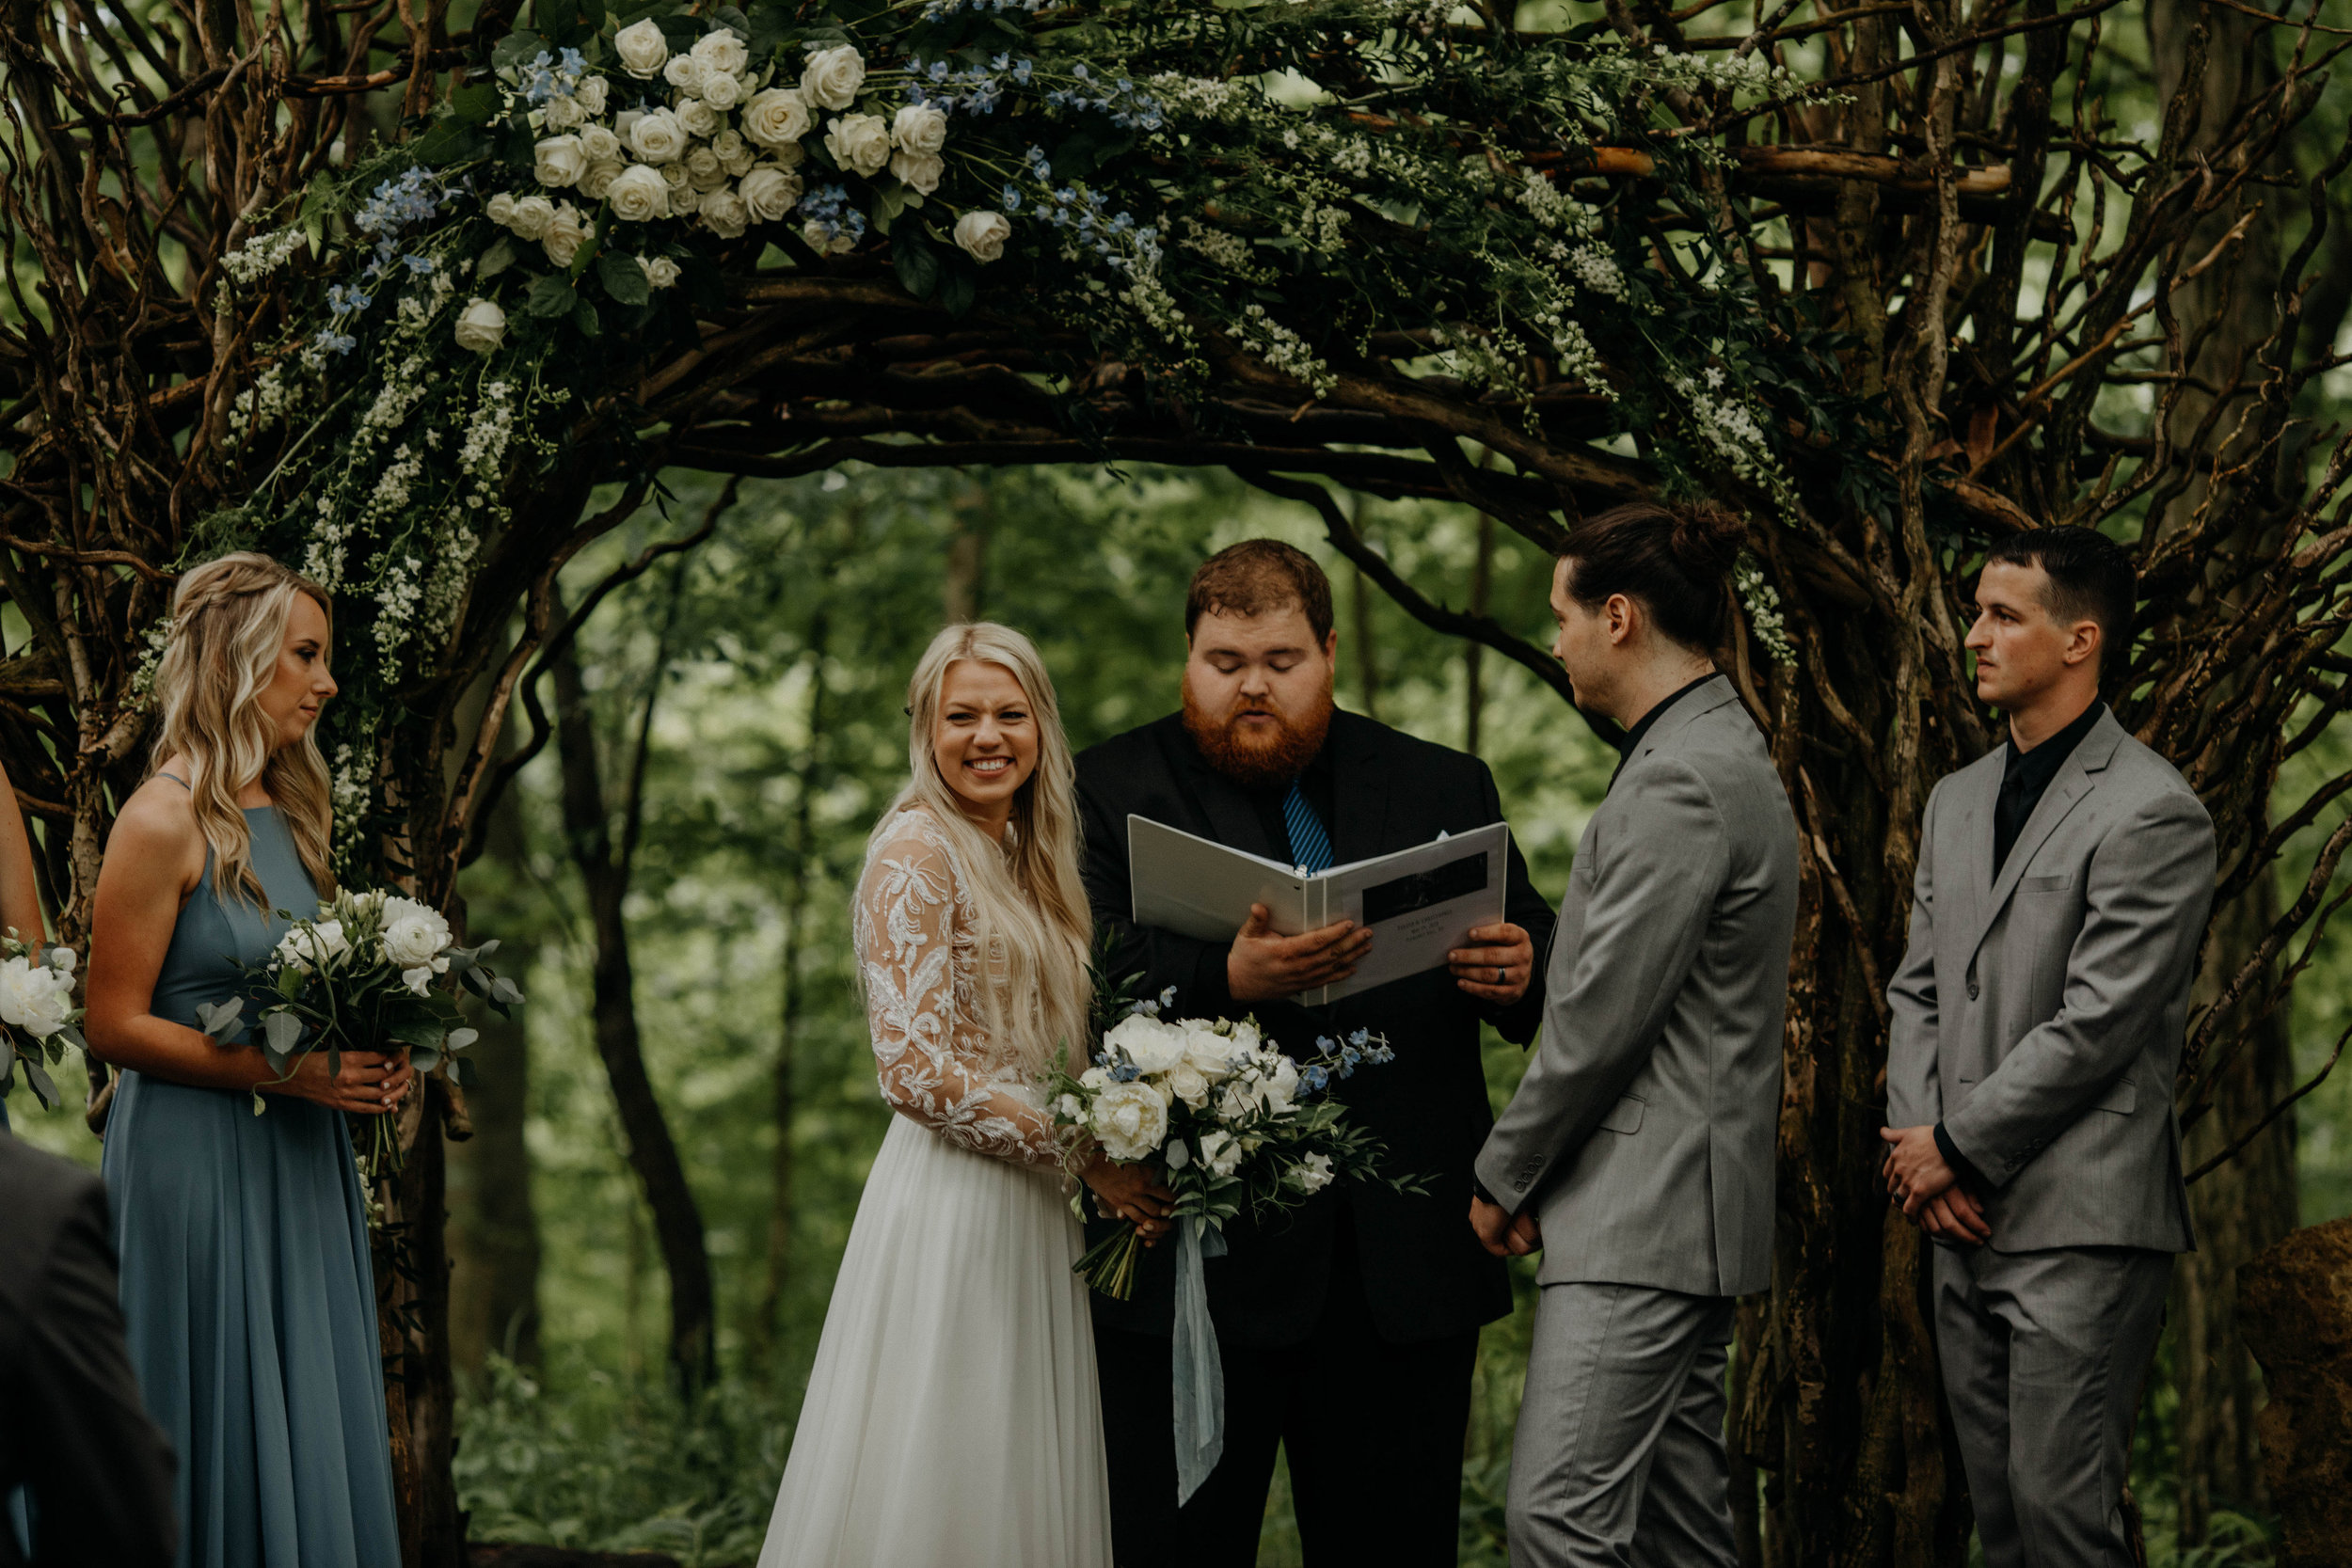 Columbus ohio wedding photographer canyon run ranch wedding grace e jones photography wedding photographer52.jpg